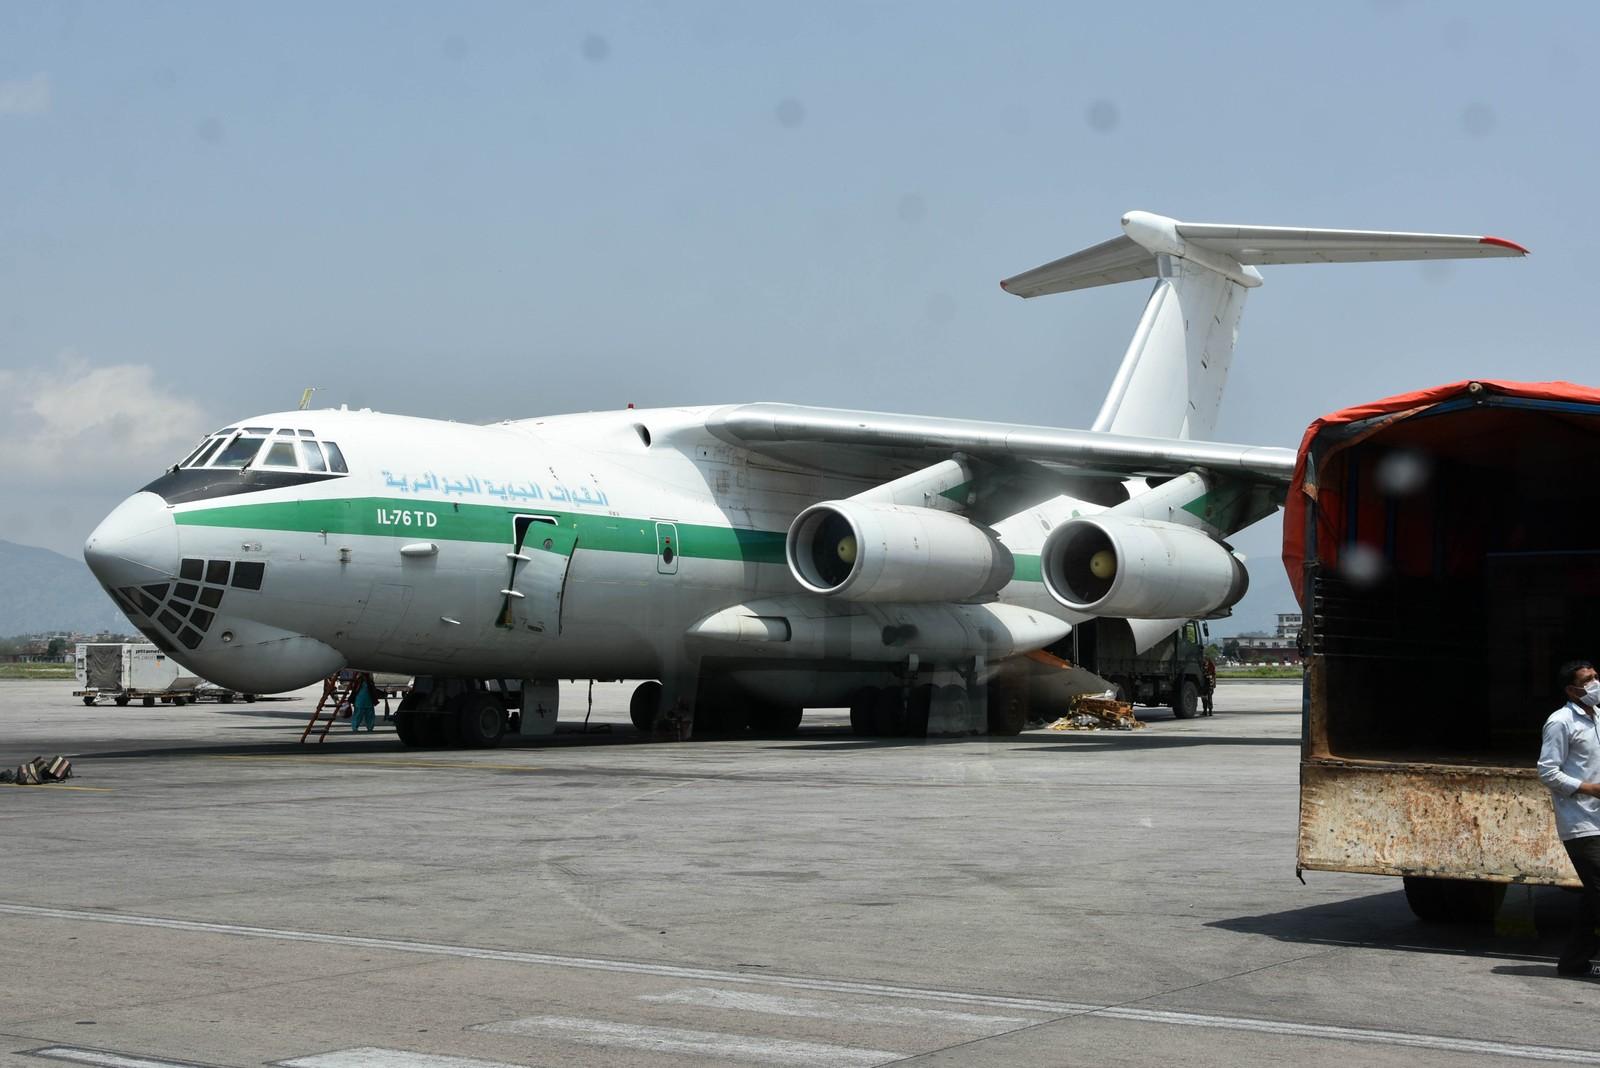 Et algerisk transportfly på flyplassen i Katmandu